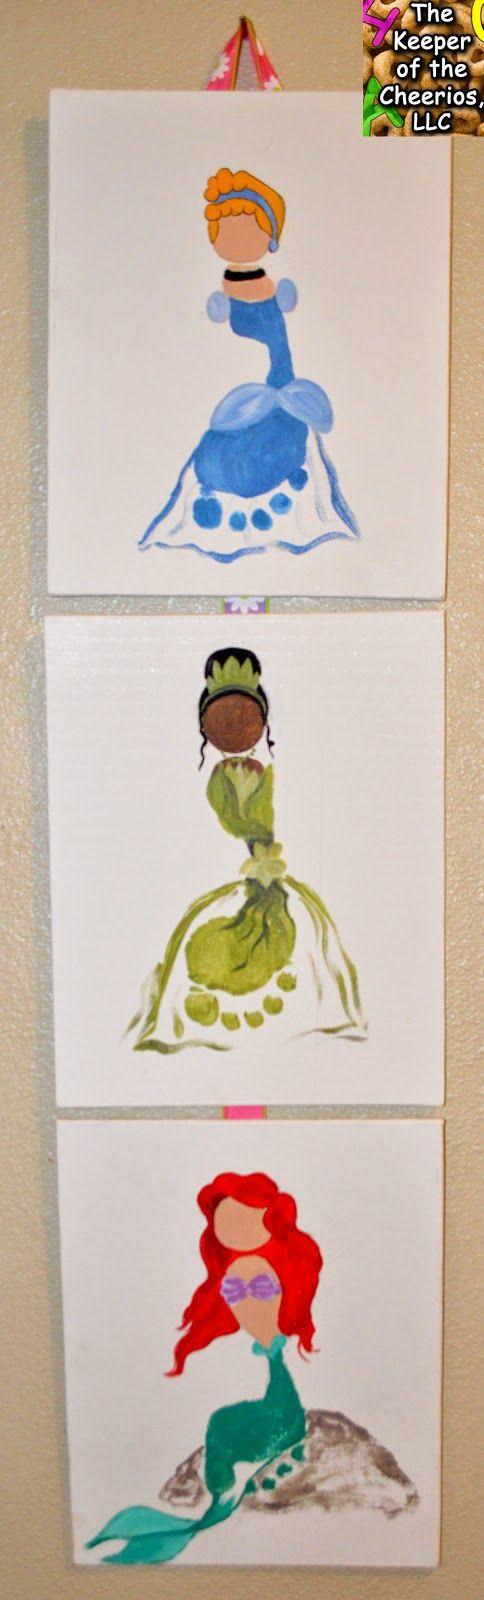 Disney Princess Footprint Craft, Cinderella Footprint, Tiana Princess and the Frog Footprint, Ariel Little Mermaid Footprint